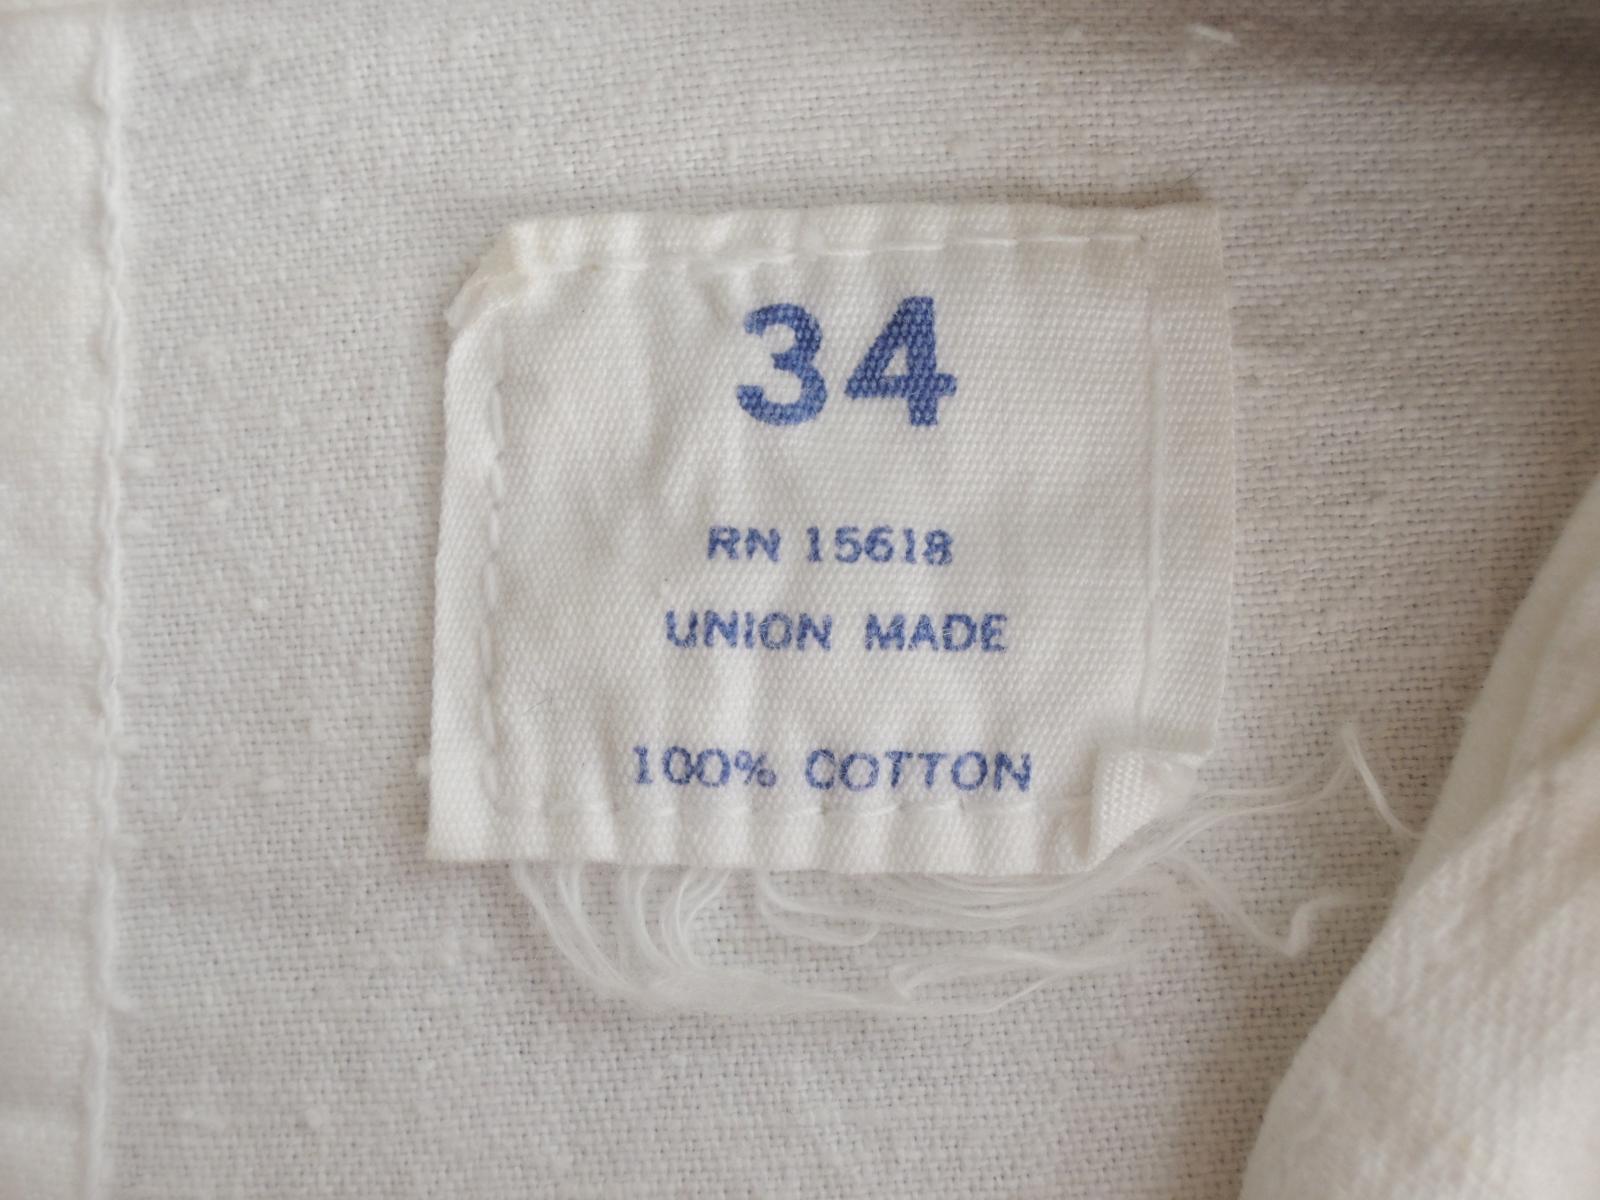 7upcottonjacket02.JPG